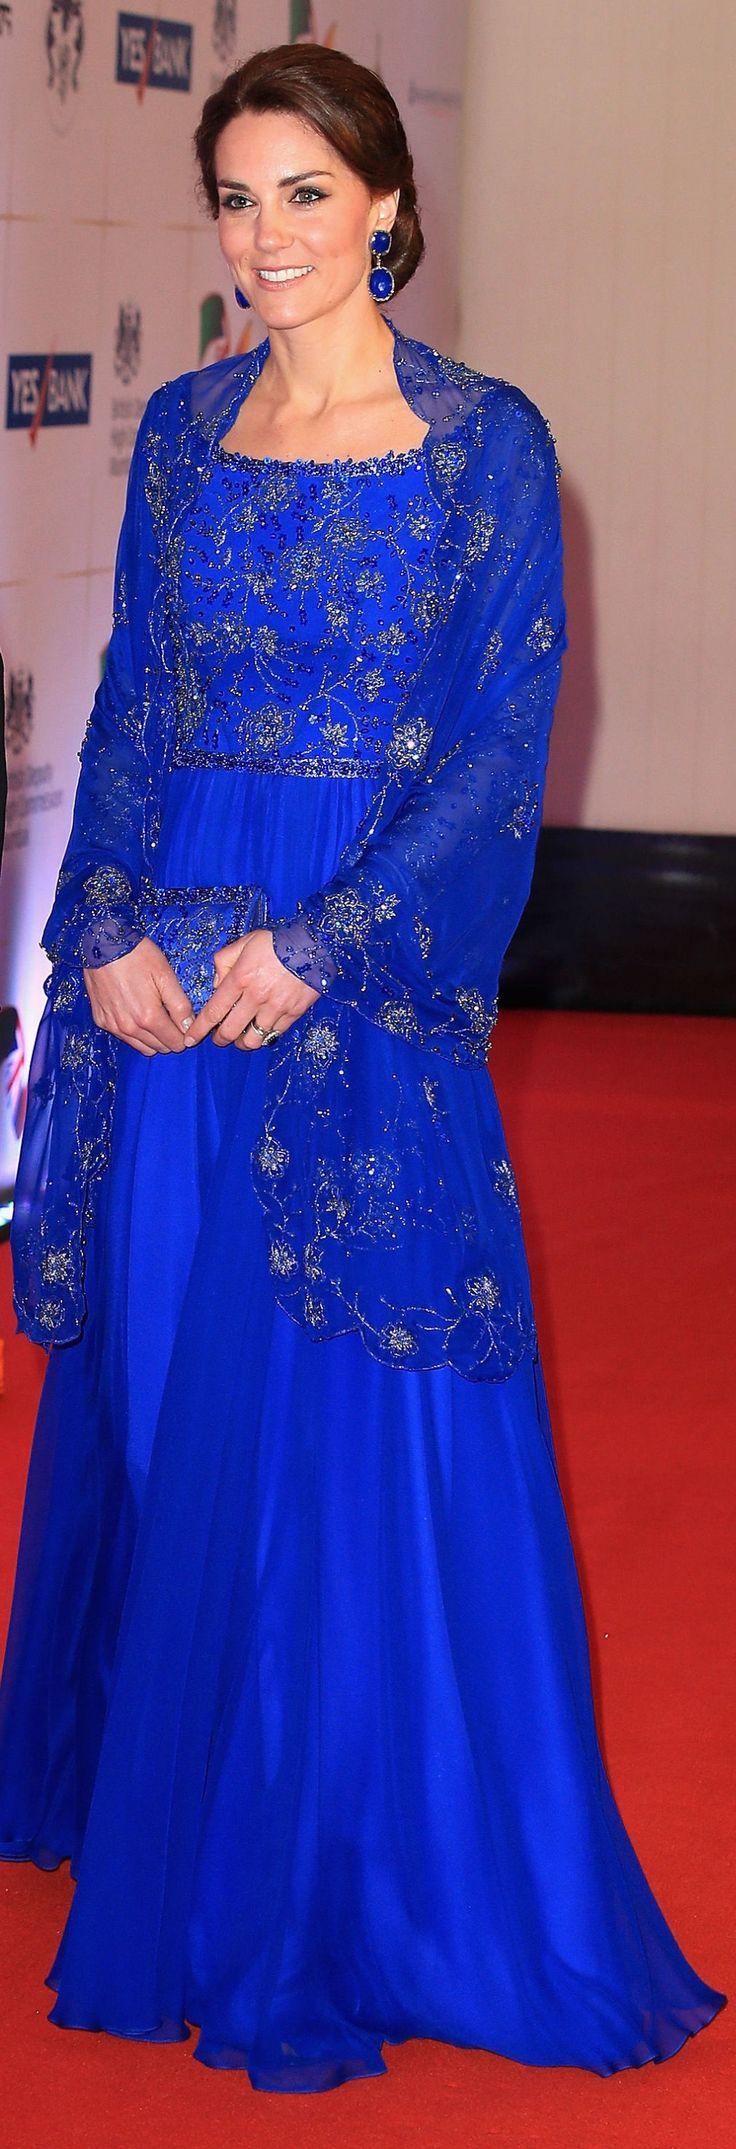 Kate Middleton at a Bollywood Inspired Charity Gala at the Taj Mahal Palace Hotel during the royal visit to India and Bhutan | 4/10/16.